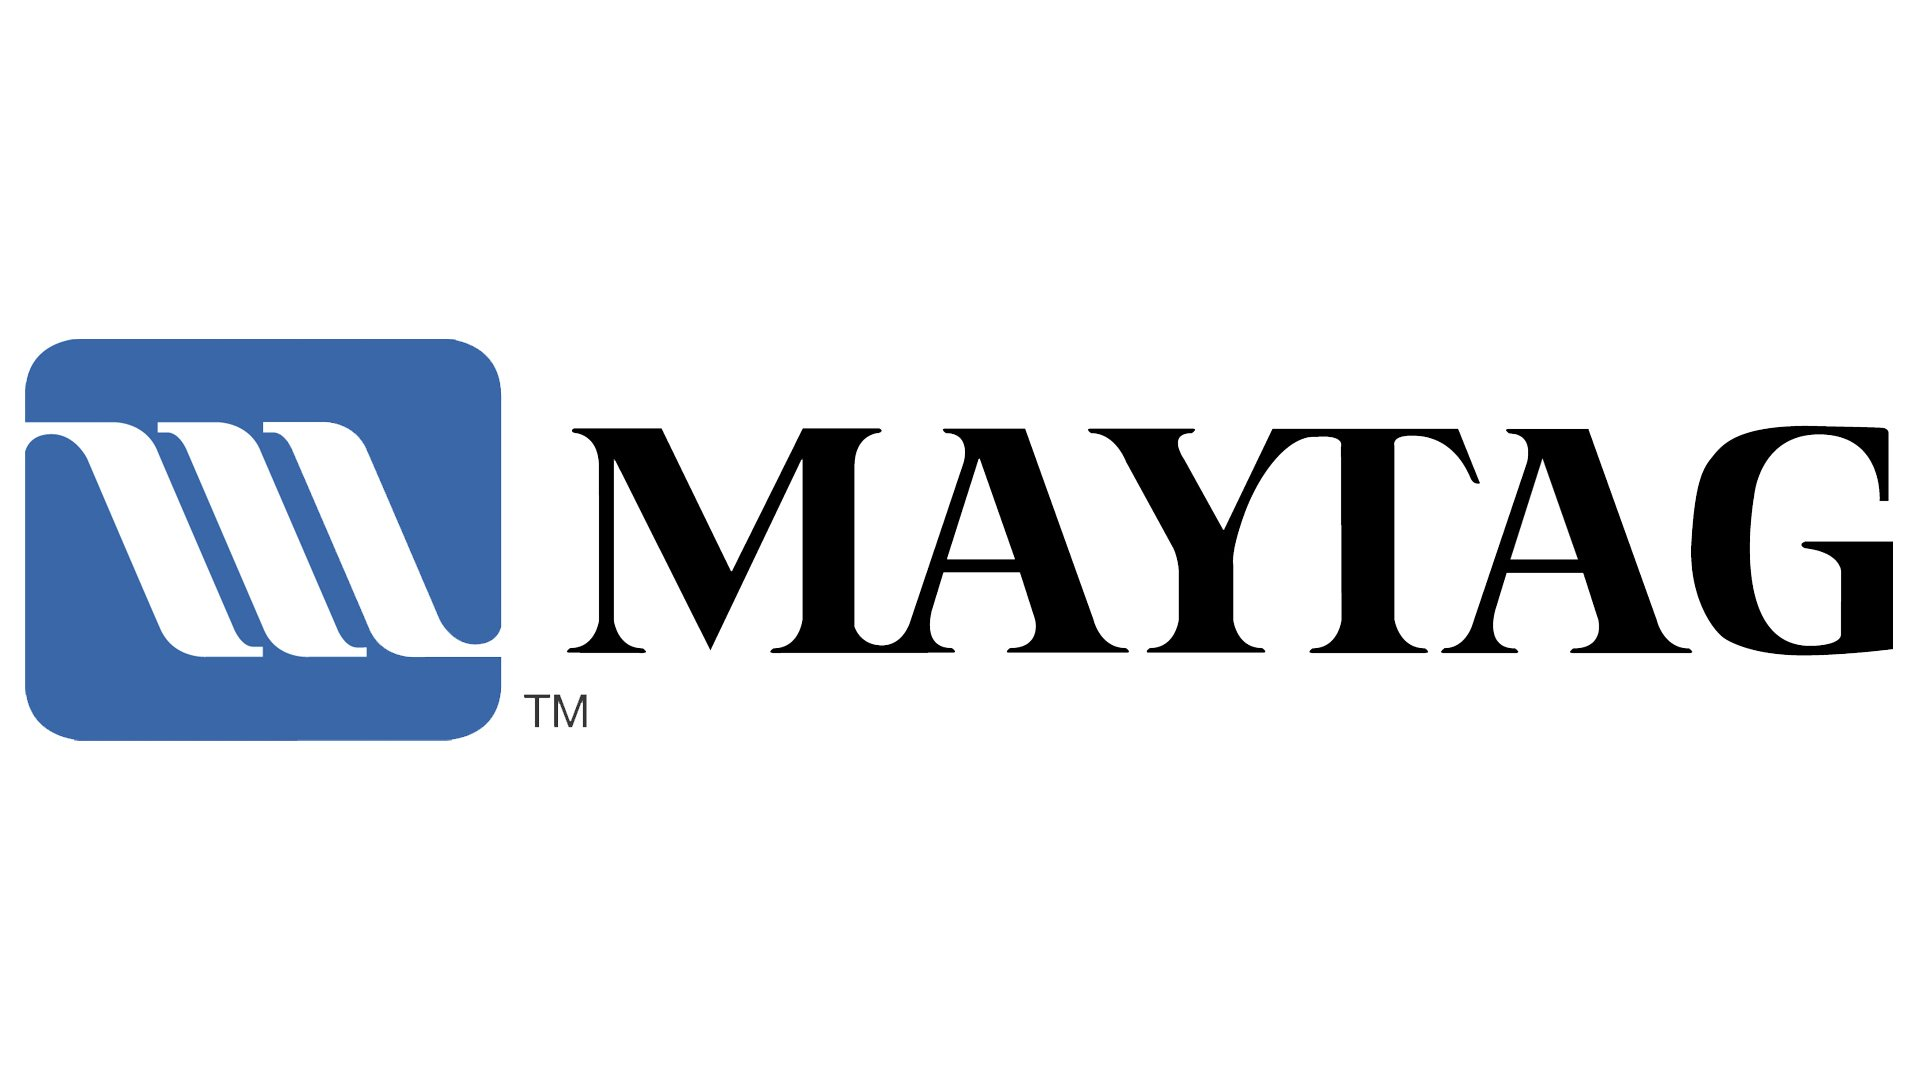 maytag logo maytag symbol meaning history and evolution